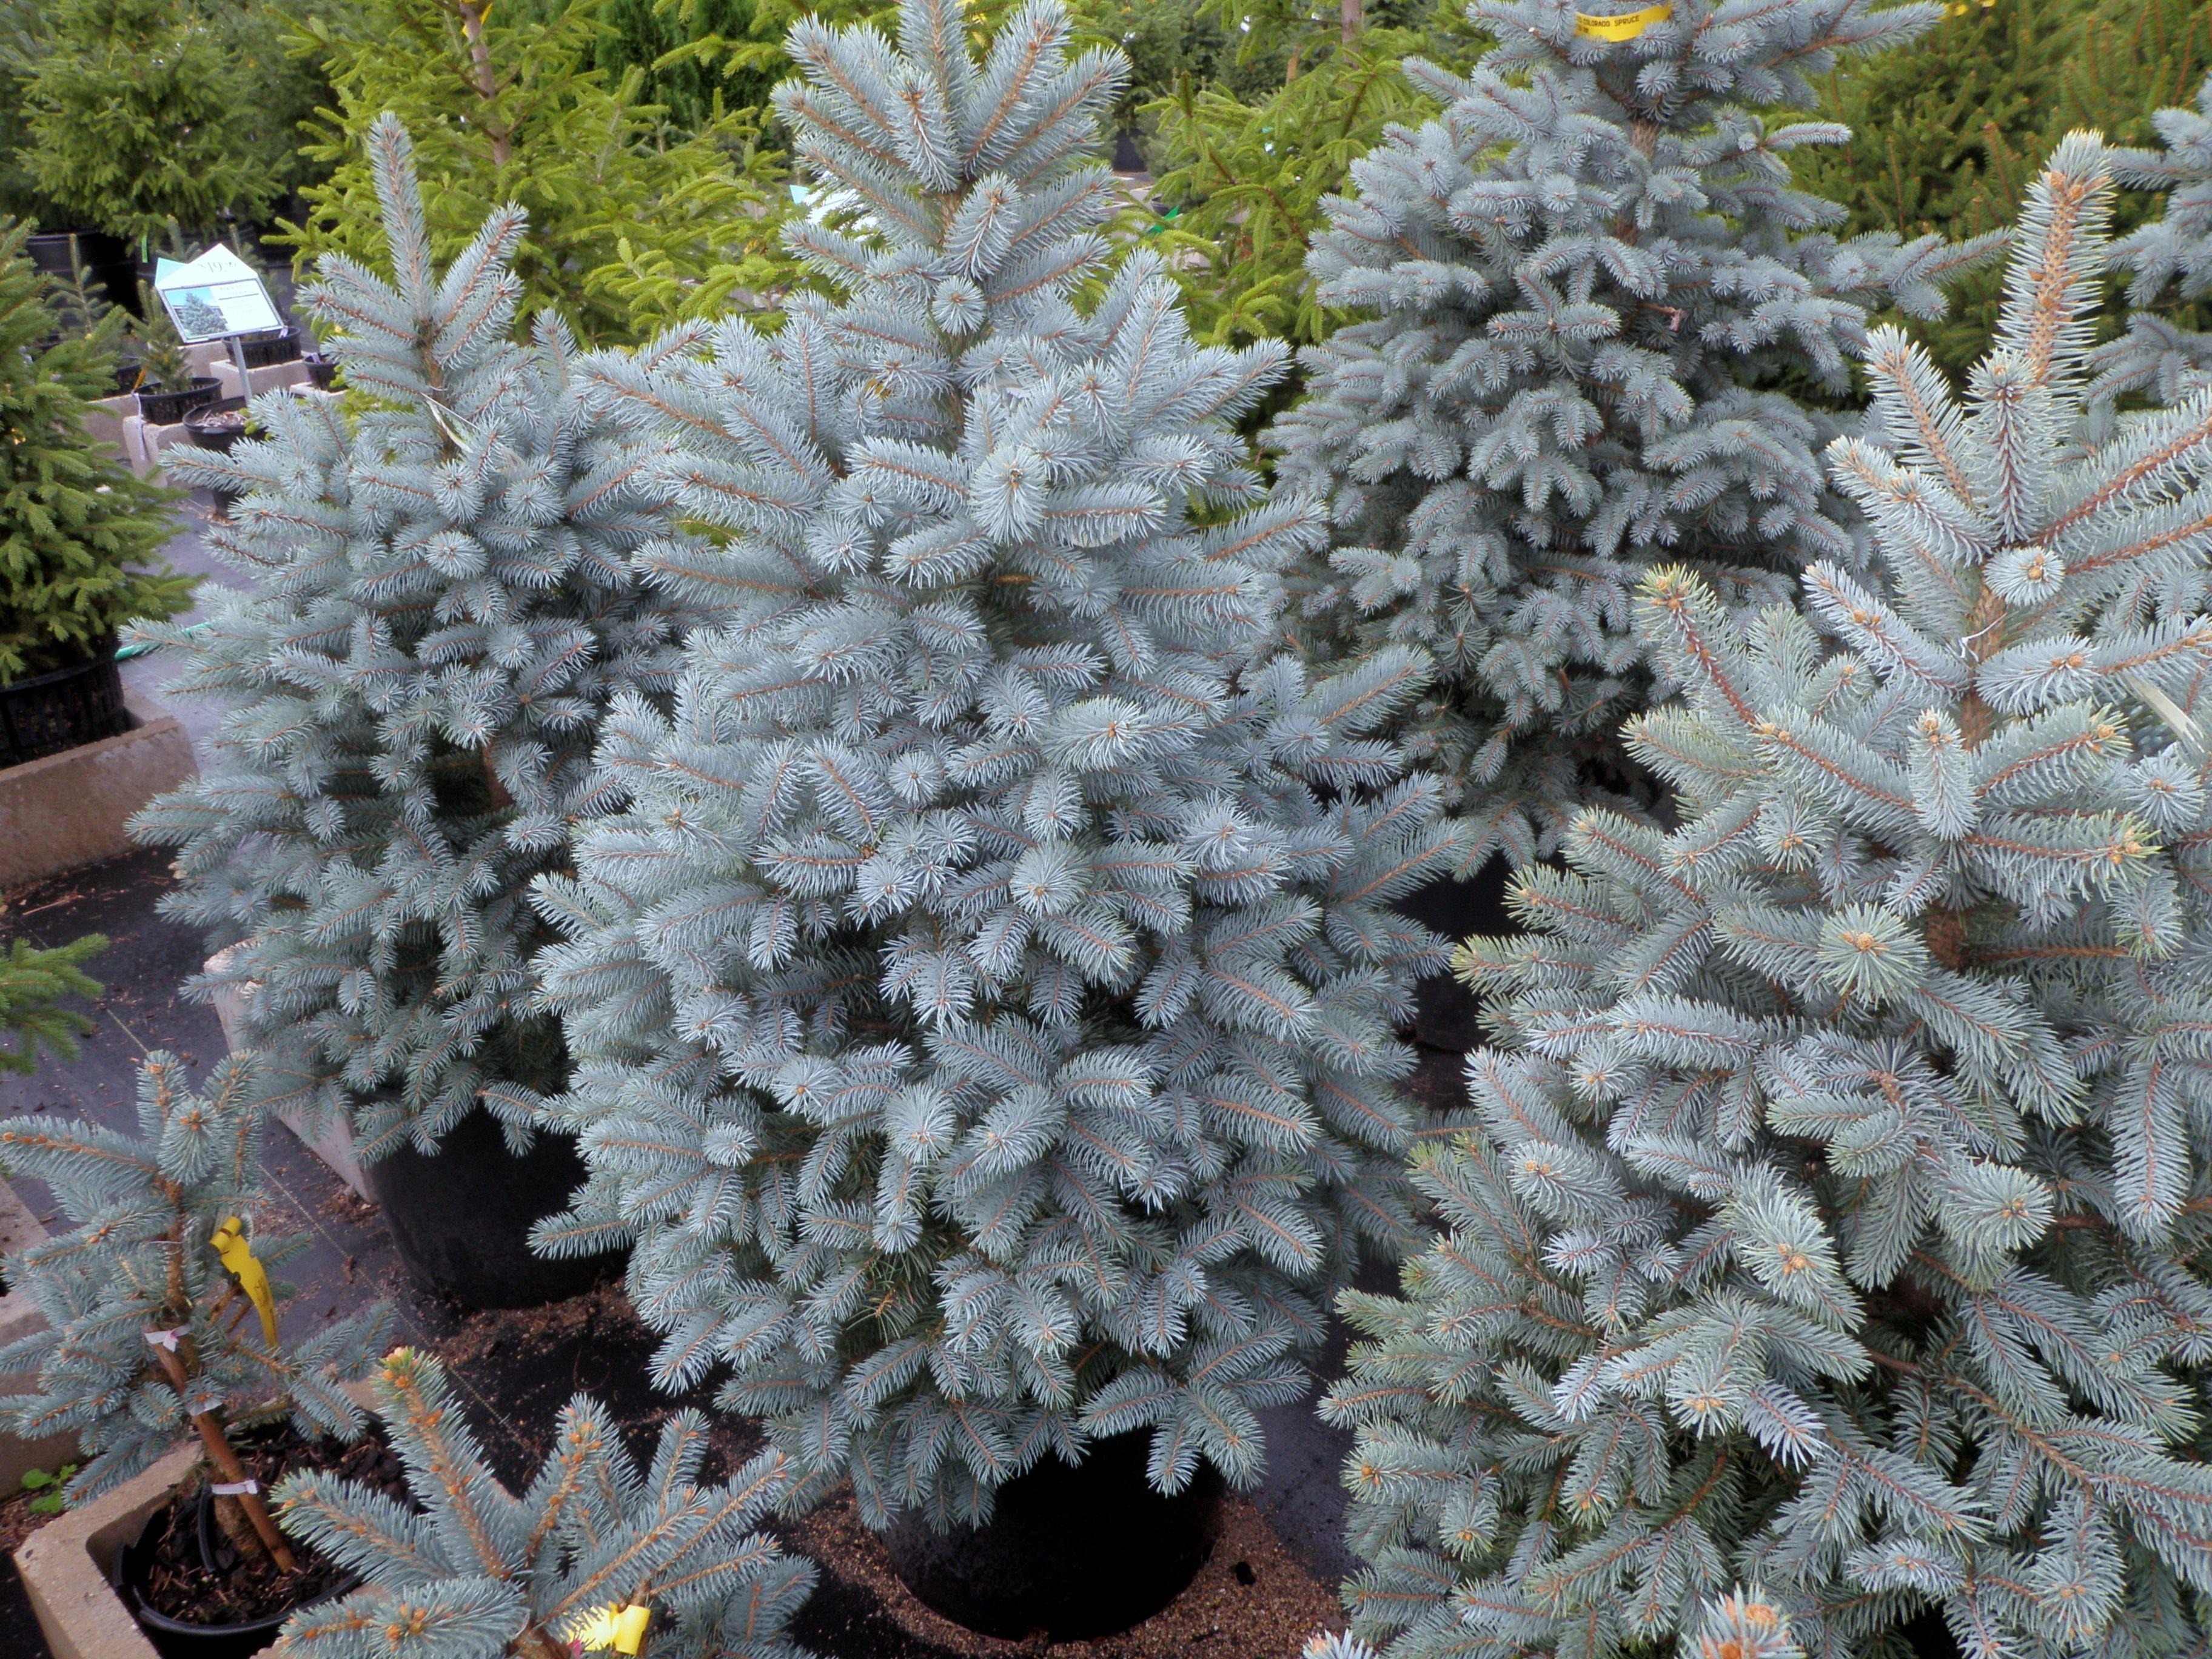 Baby Blue Eyes Colorado Spruce Knecht S Nurseries Landscaping Blue Spruce Tree Colorado Spruce Conifers Garden